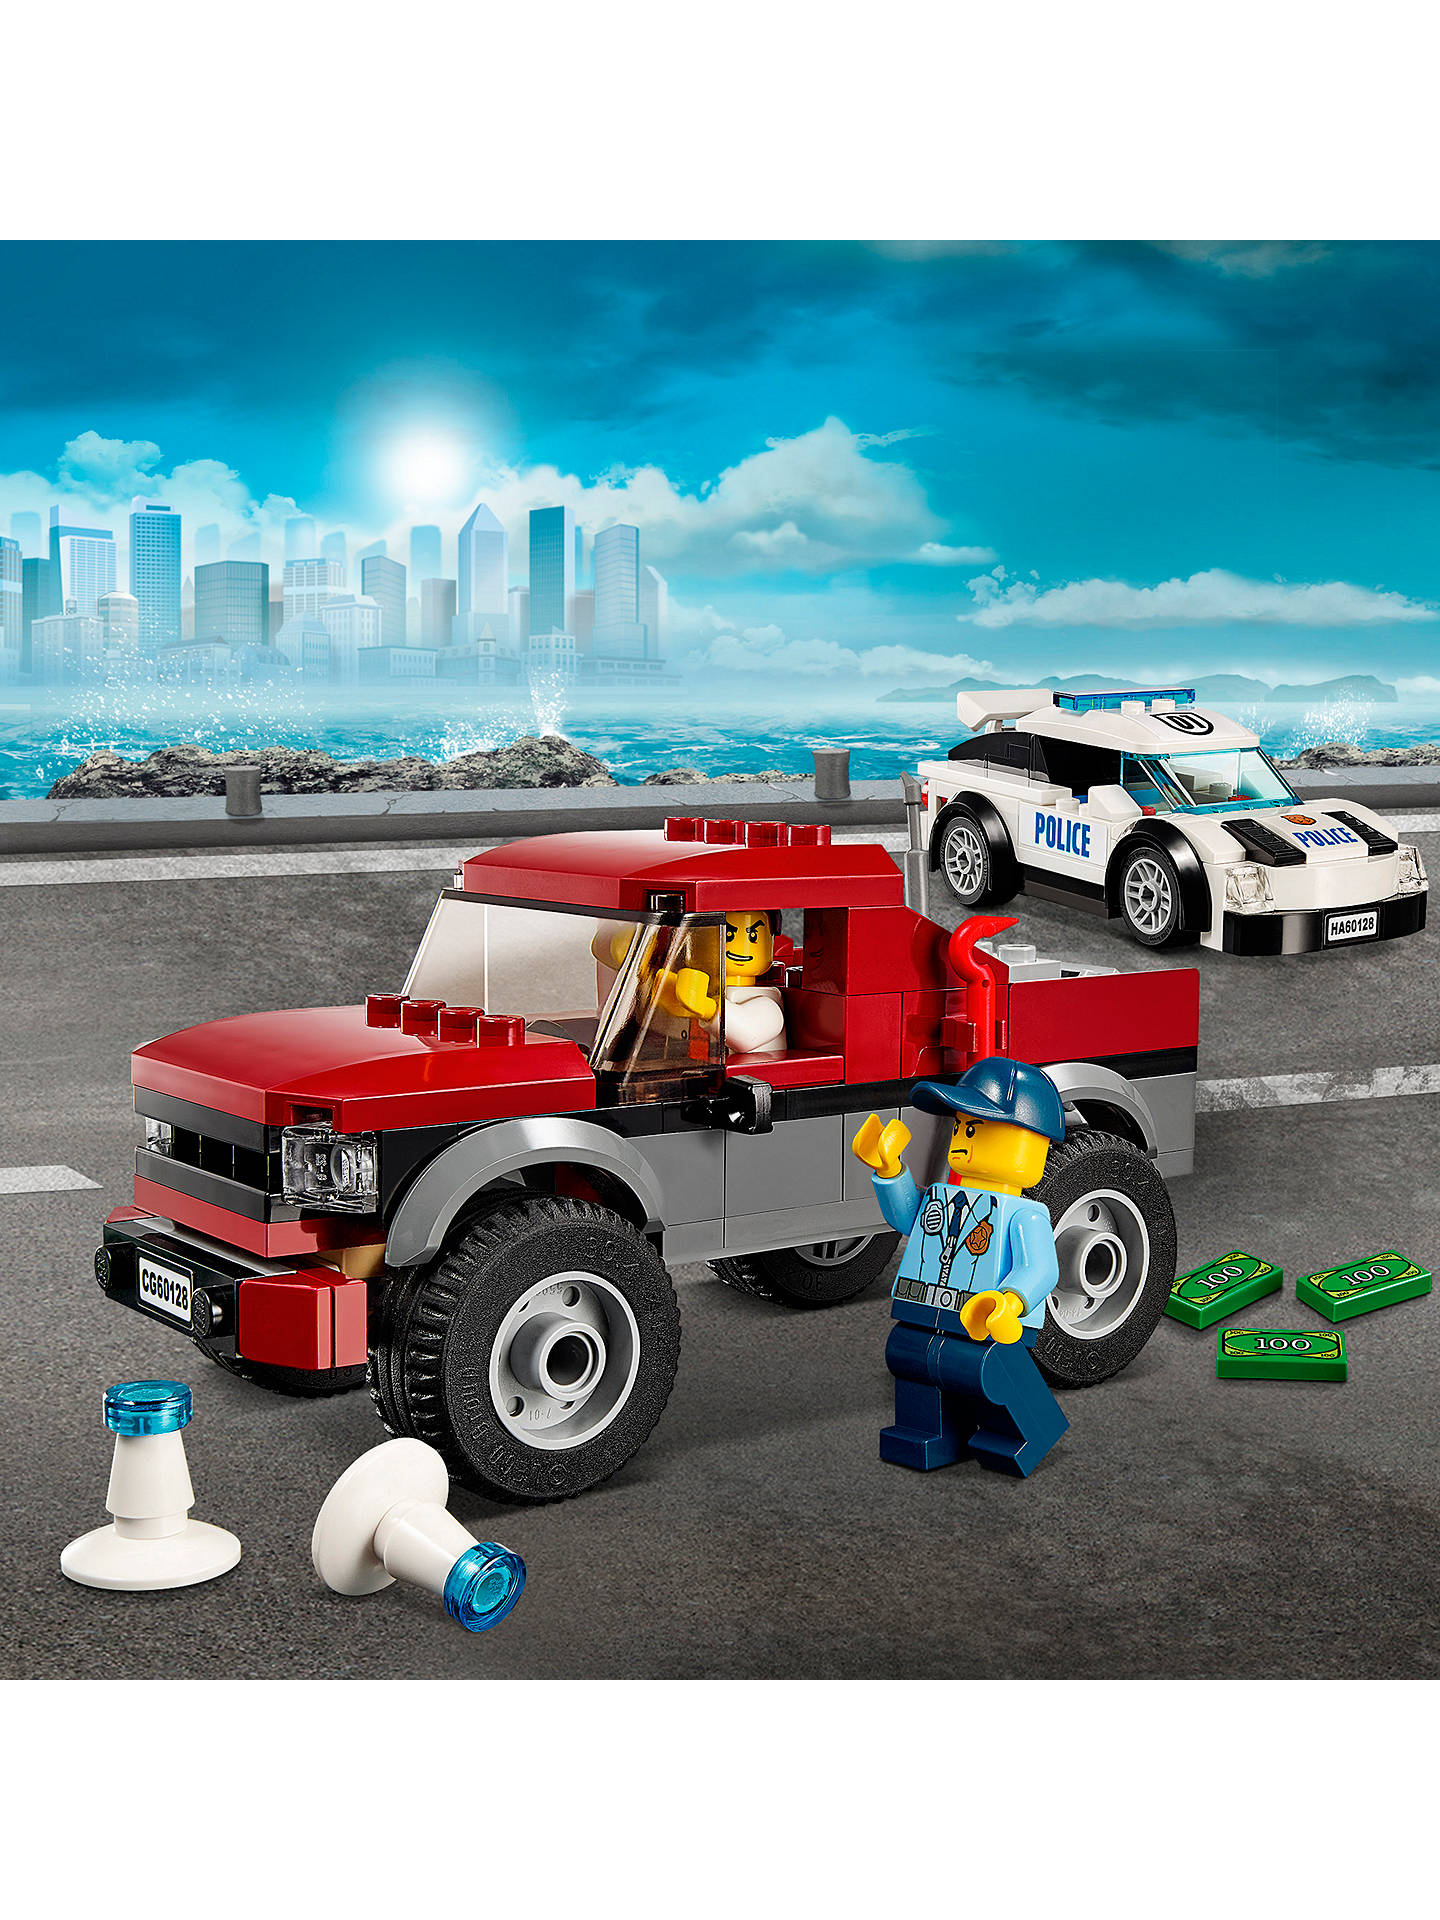 Lego City 60128 Police Pursuit At John Lewis Partners